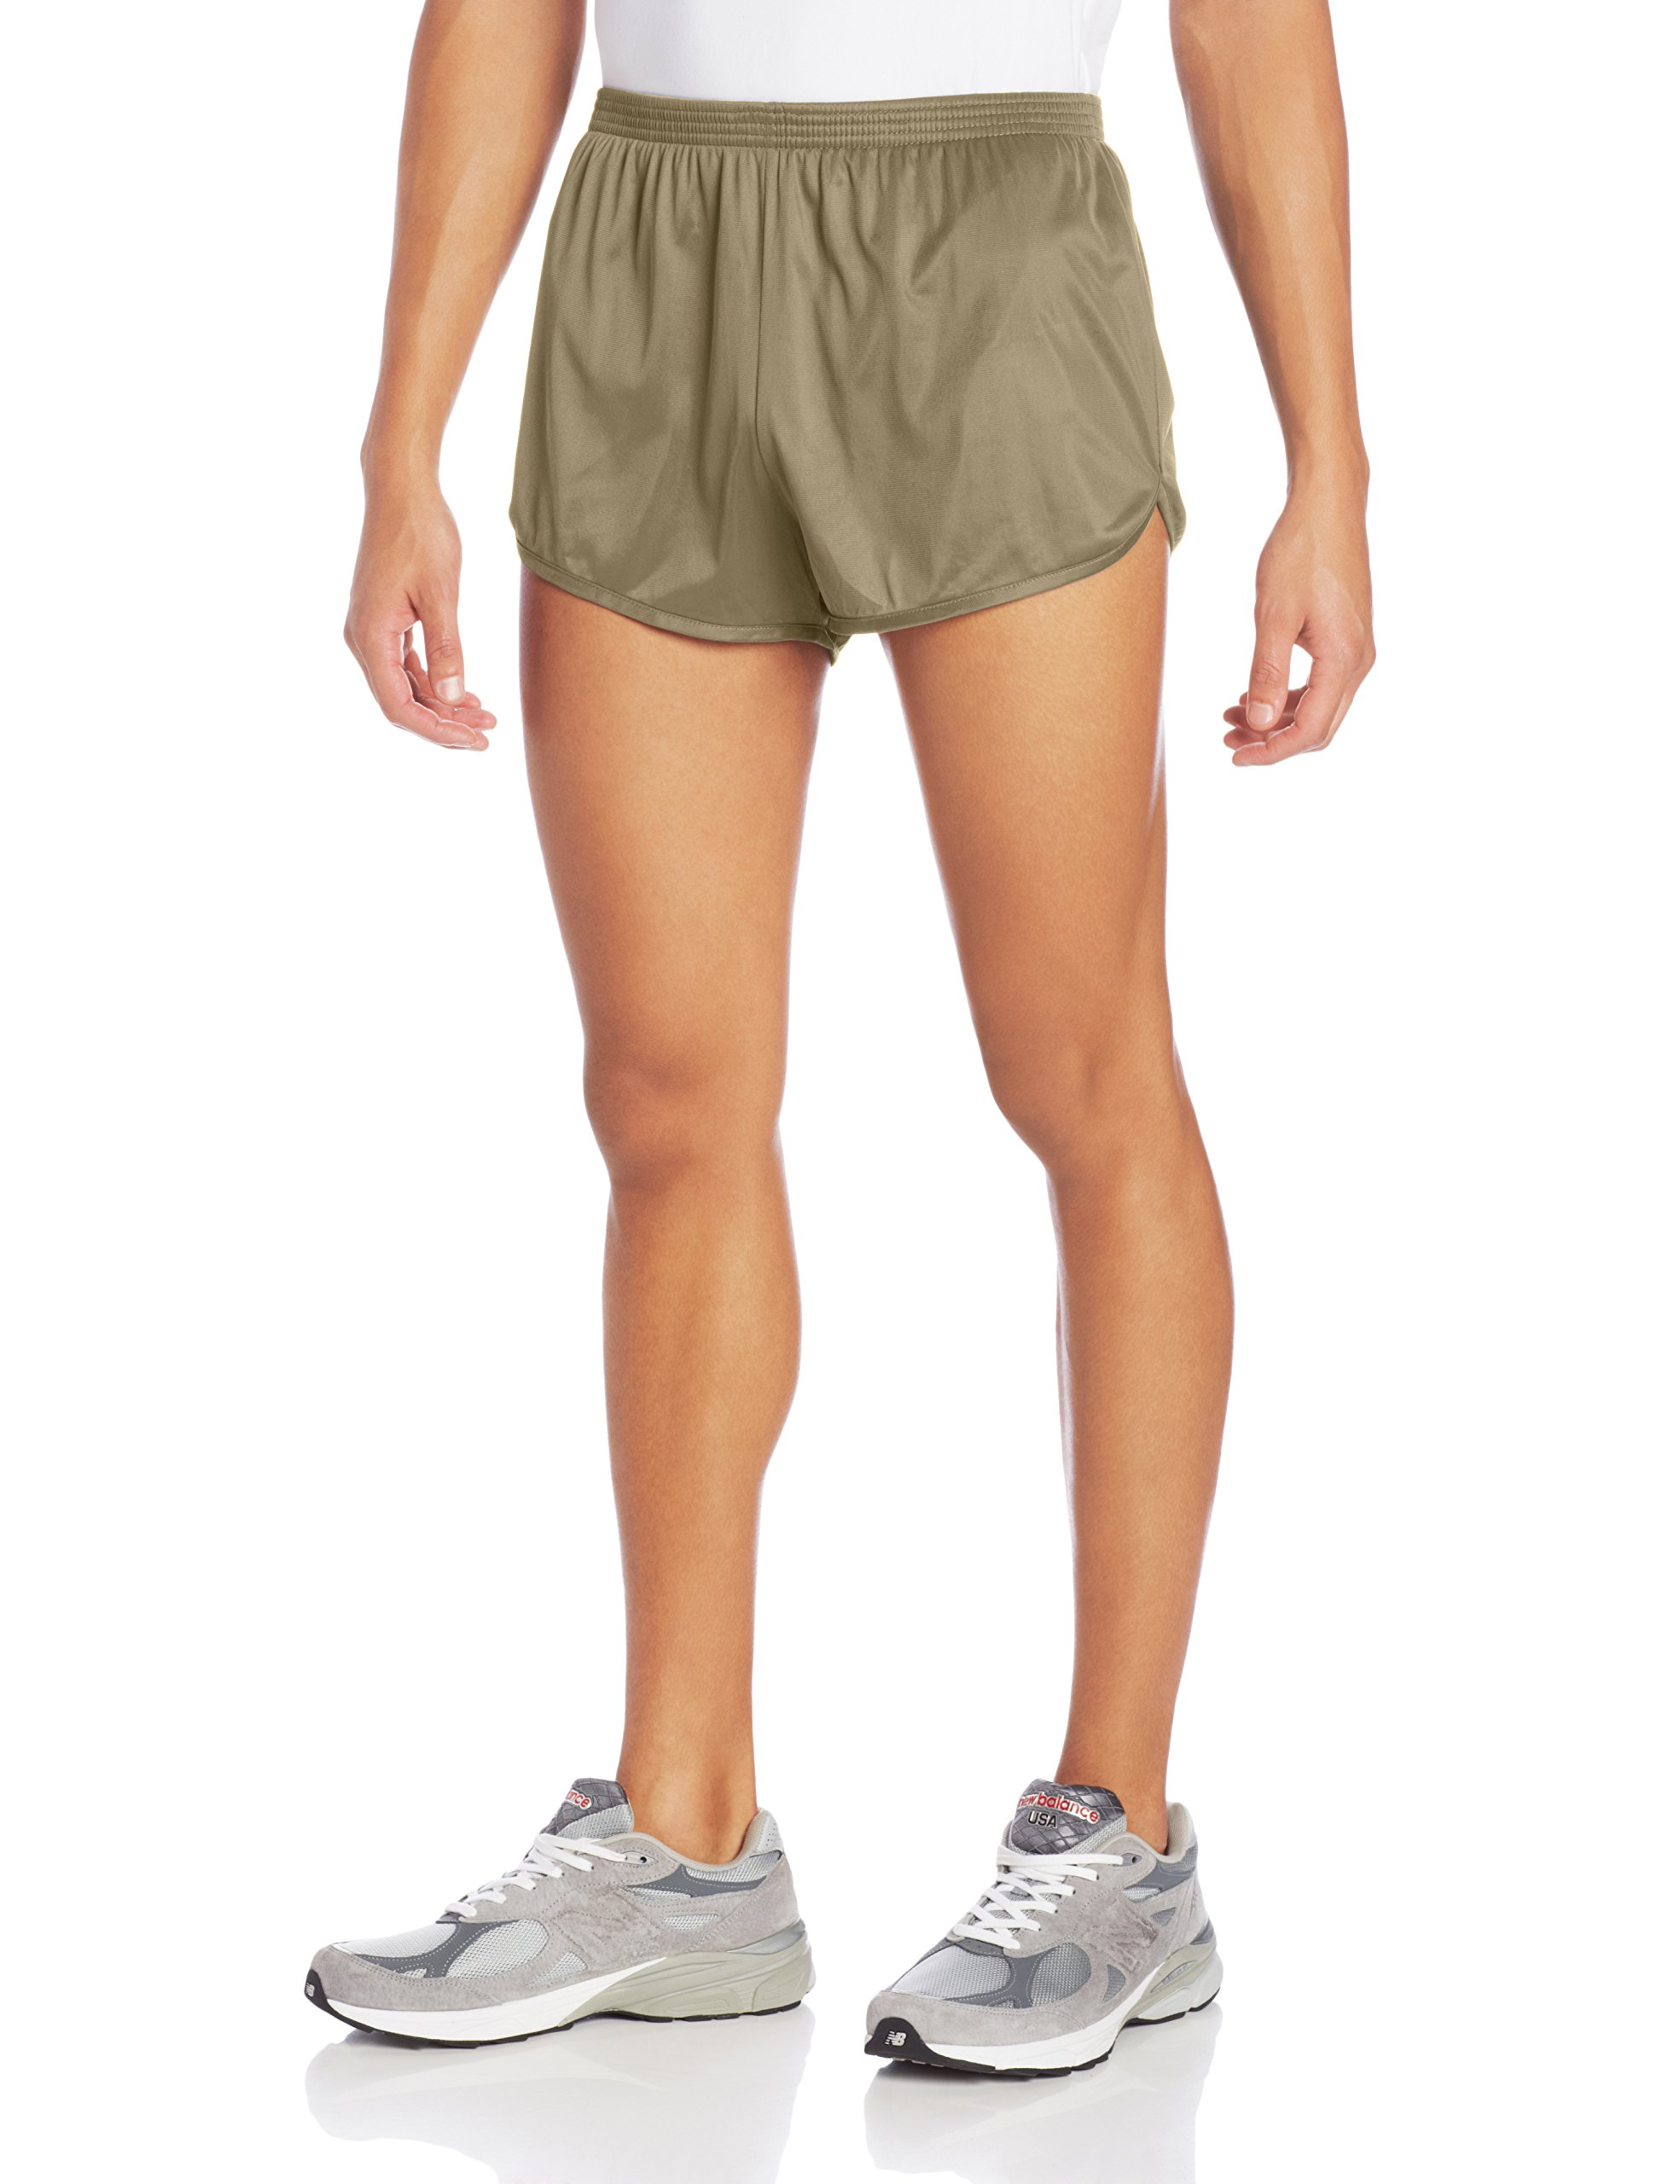 Soffe Men's Ranger Panty Running Short, Tan, Large by Soffe